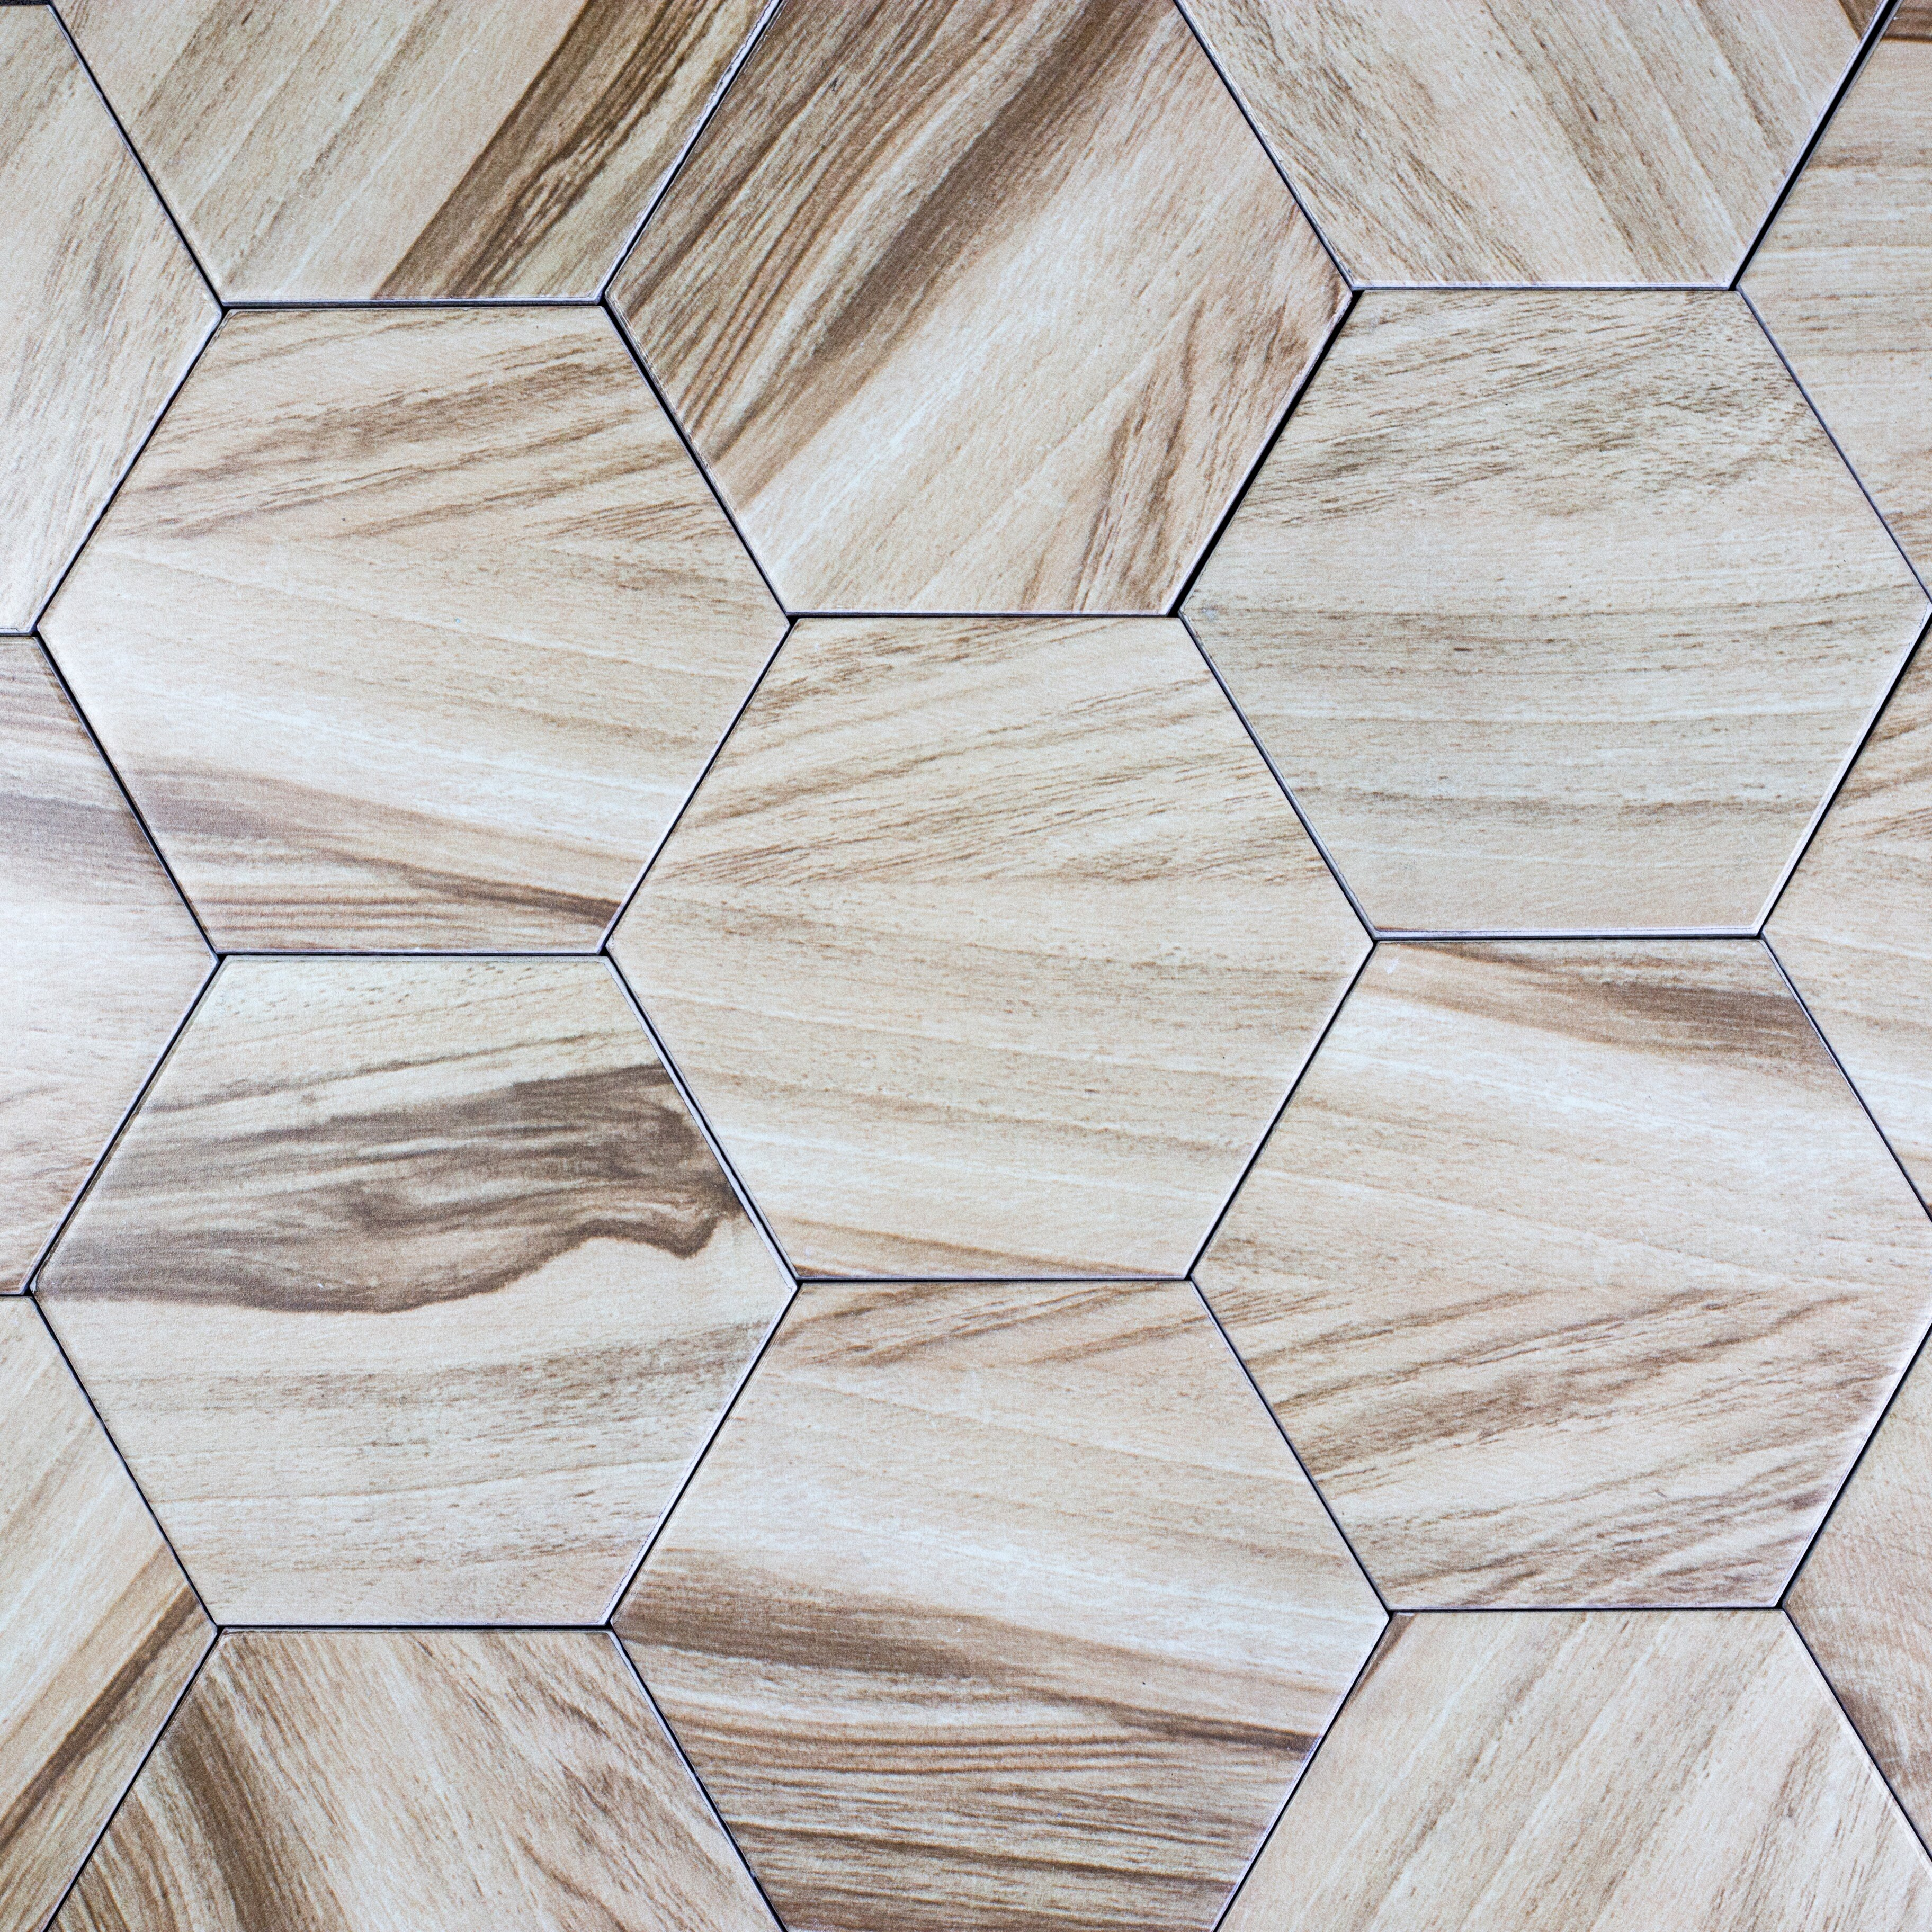 Abolos artisan wood hexagon 8 x 8 ceramic wood look tile in tan abolos artisan wood hexagon 8 x 8 ceramic wood look tile in tan reviews wayfair dailygadgetfo Choice Image